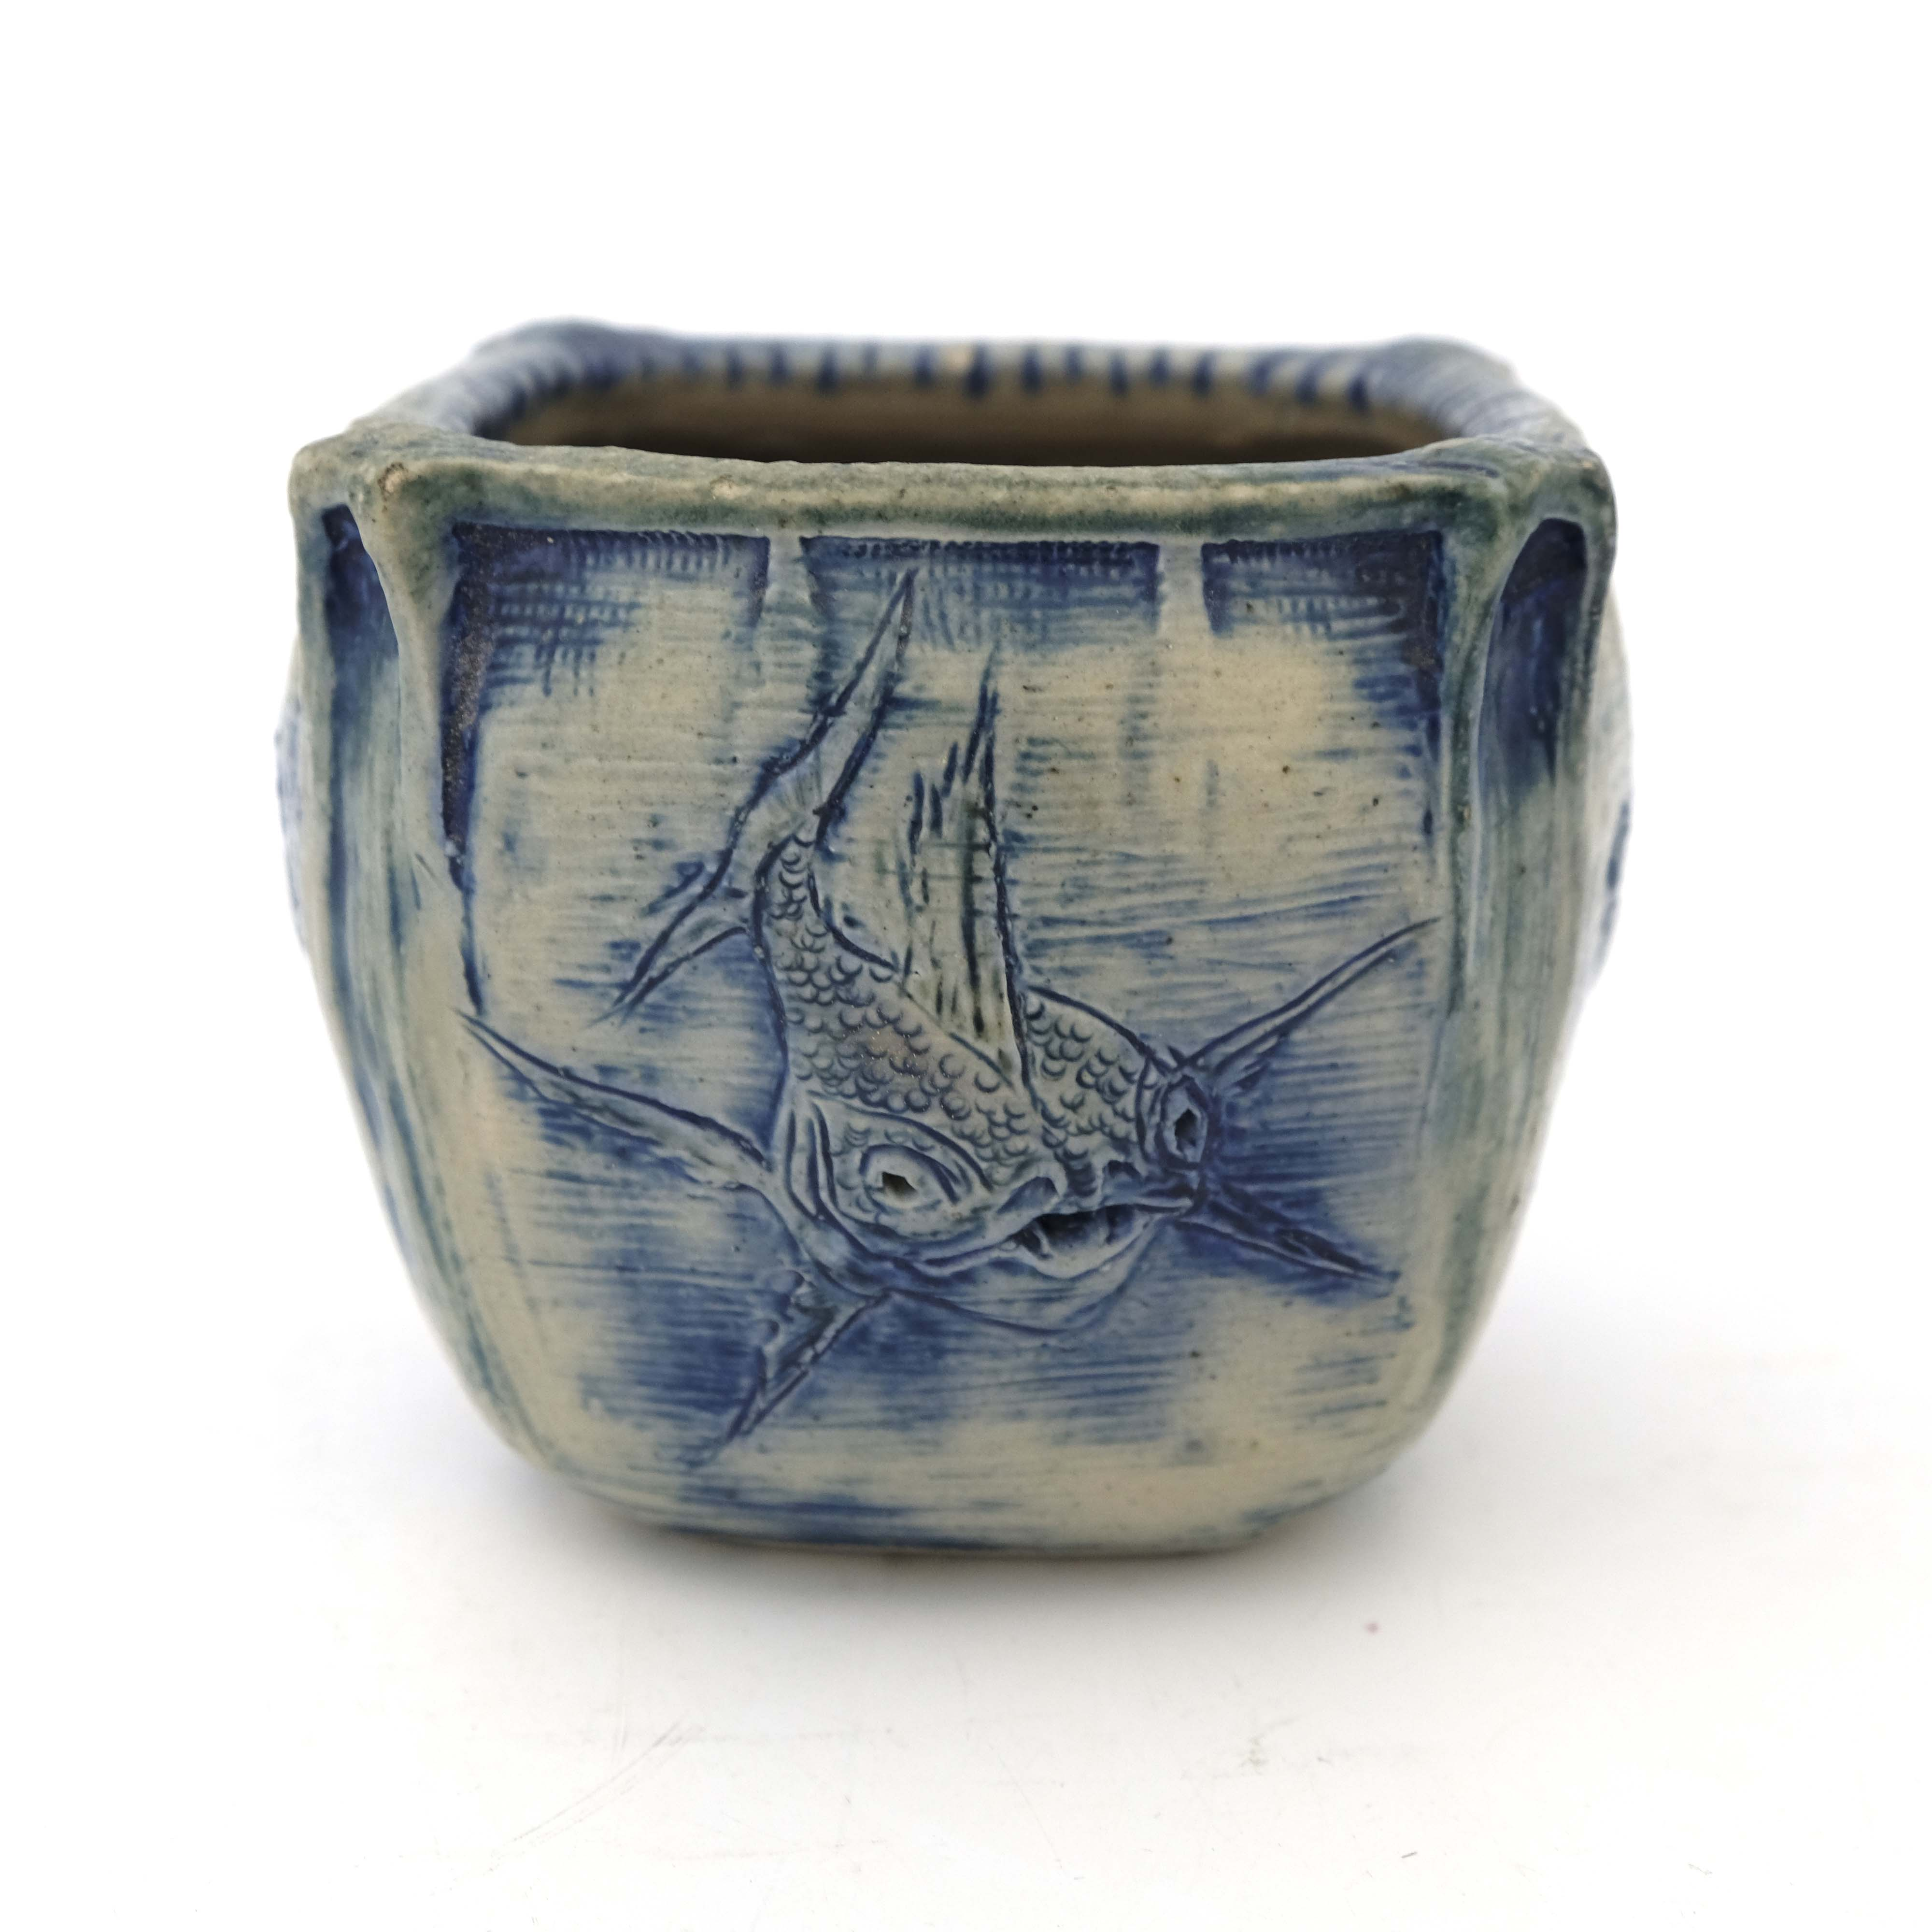 Edwin Martin for Martin Brothers, a stoneware aqua